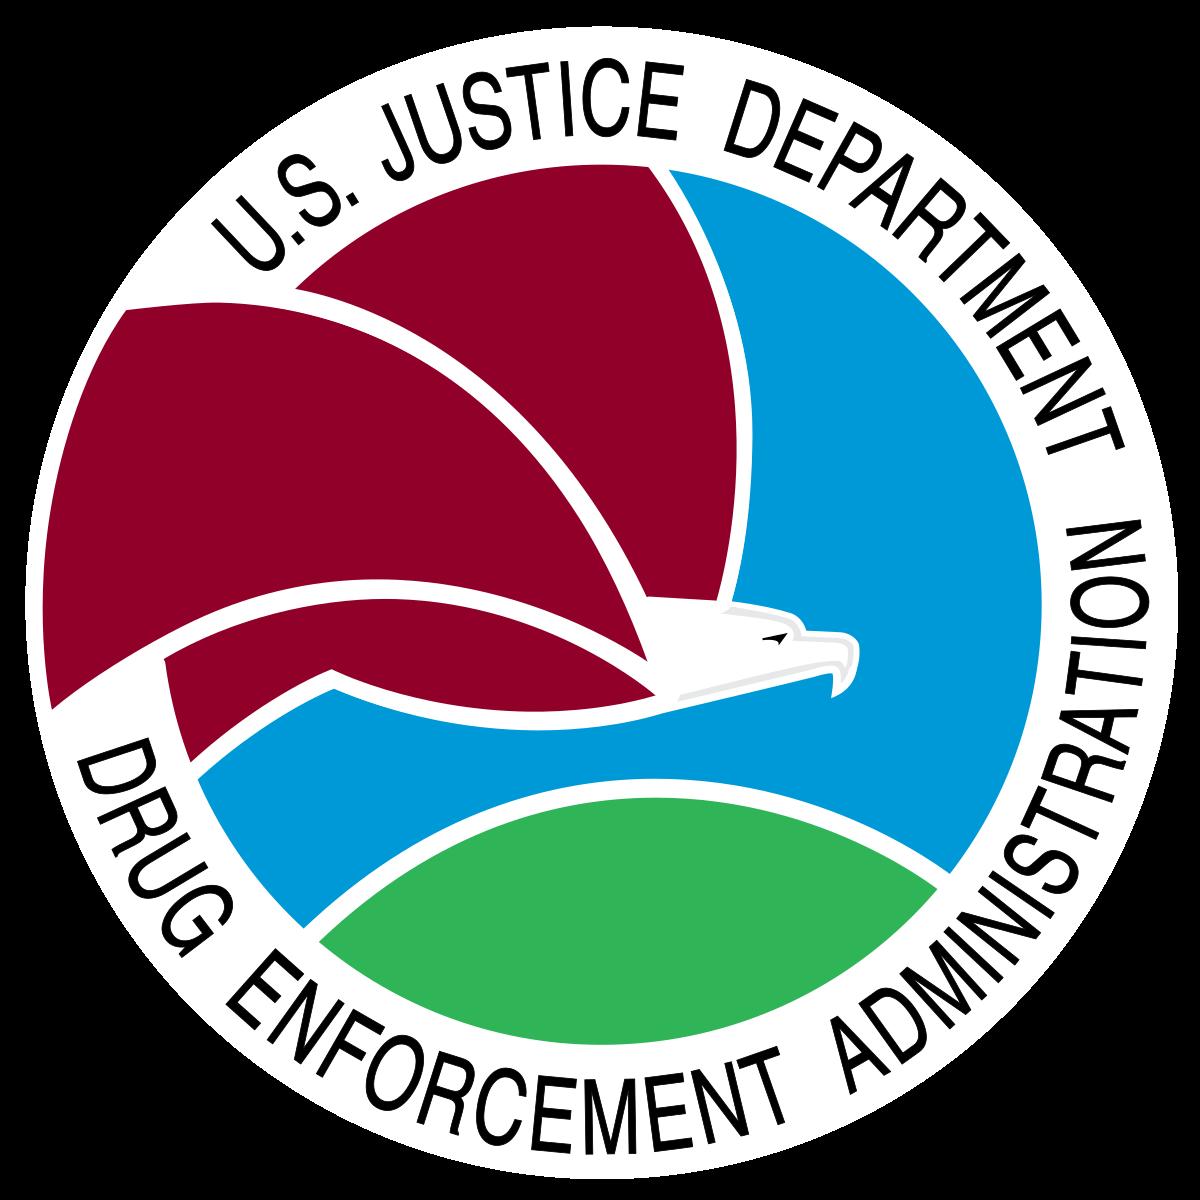 Drug Enforcement Administration (DEA) 1